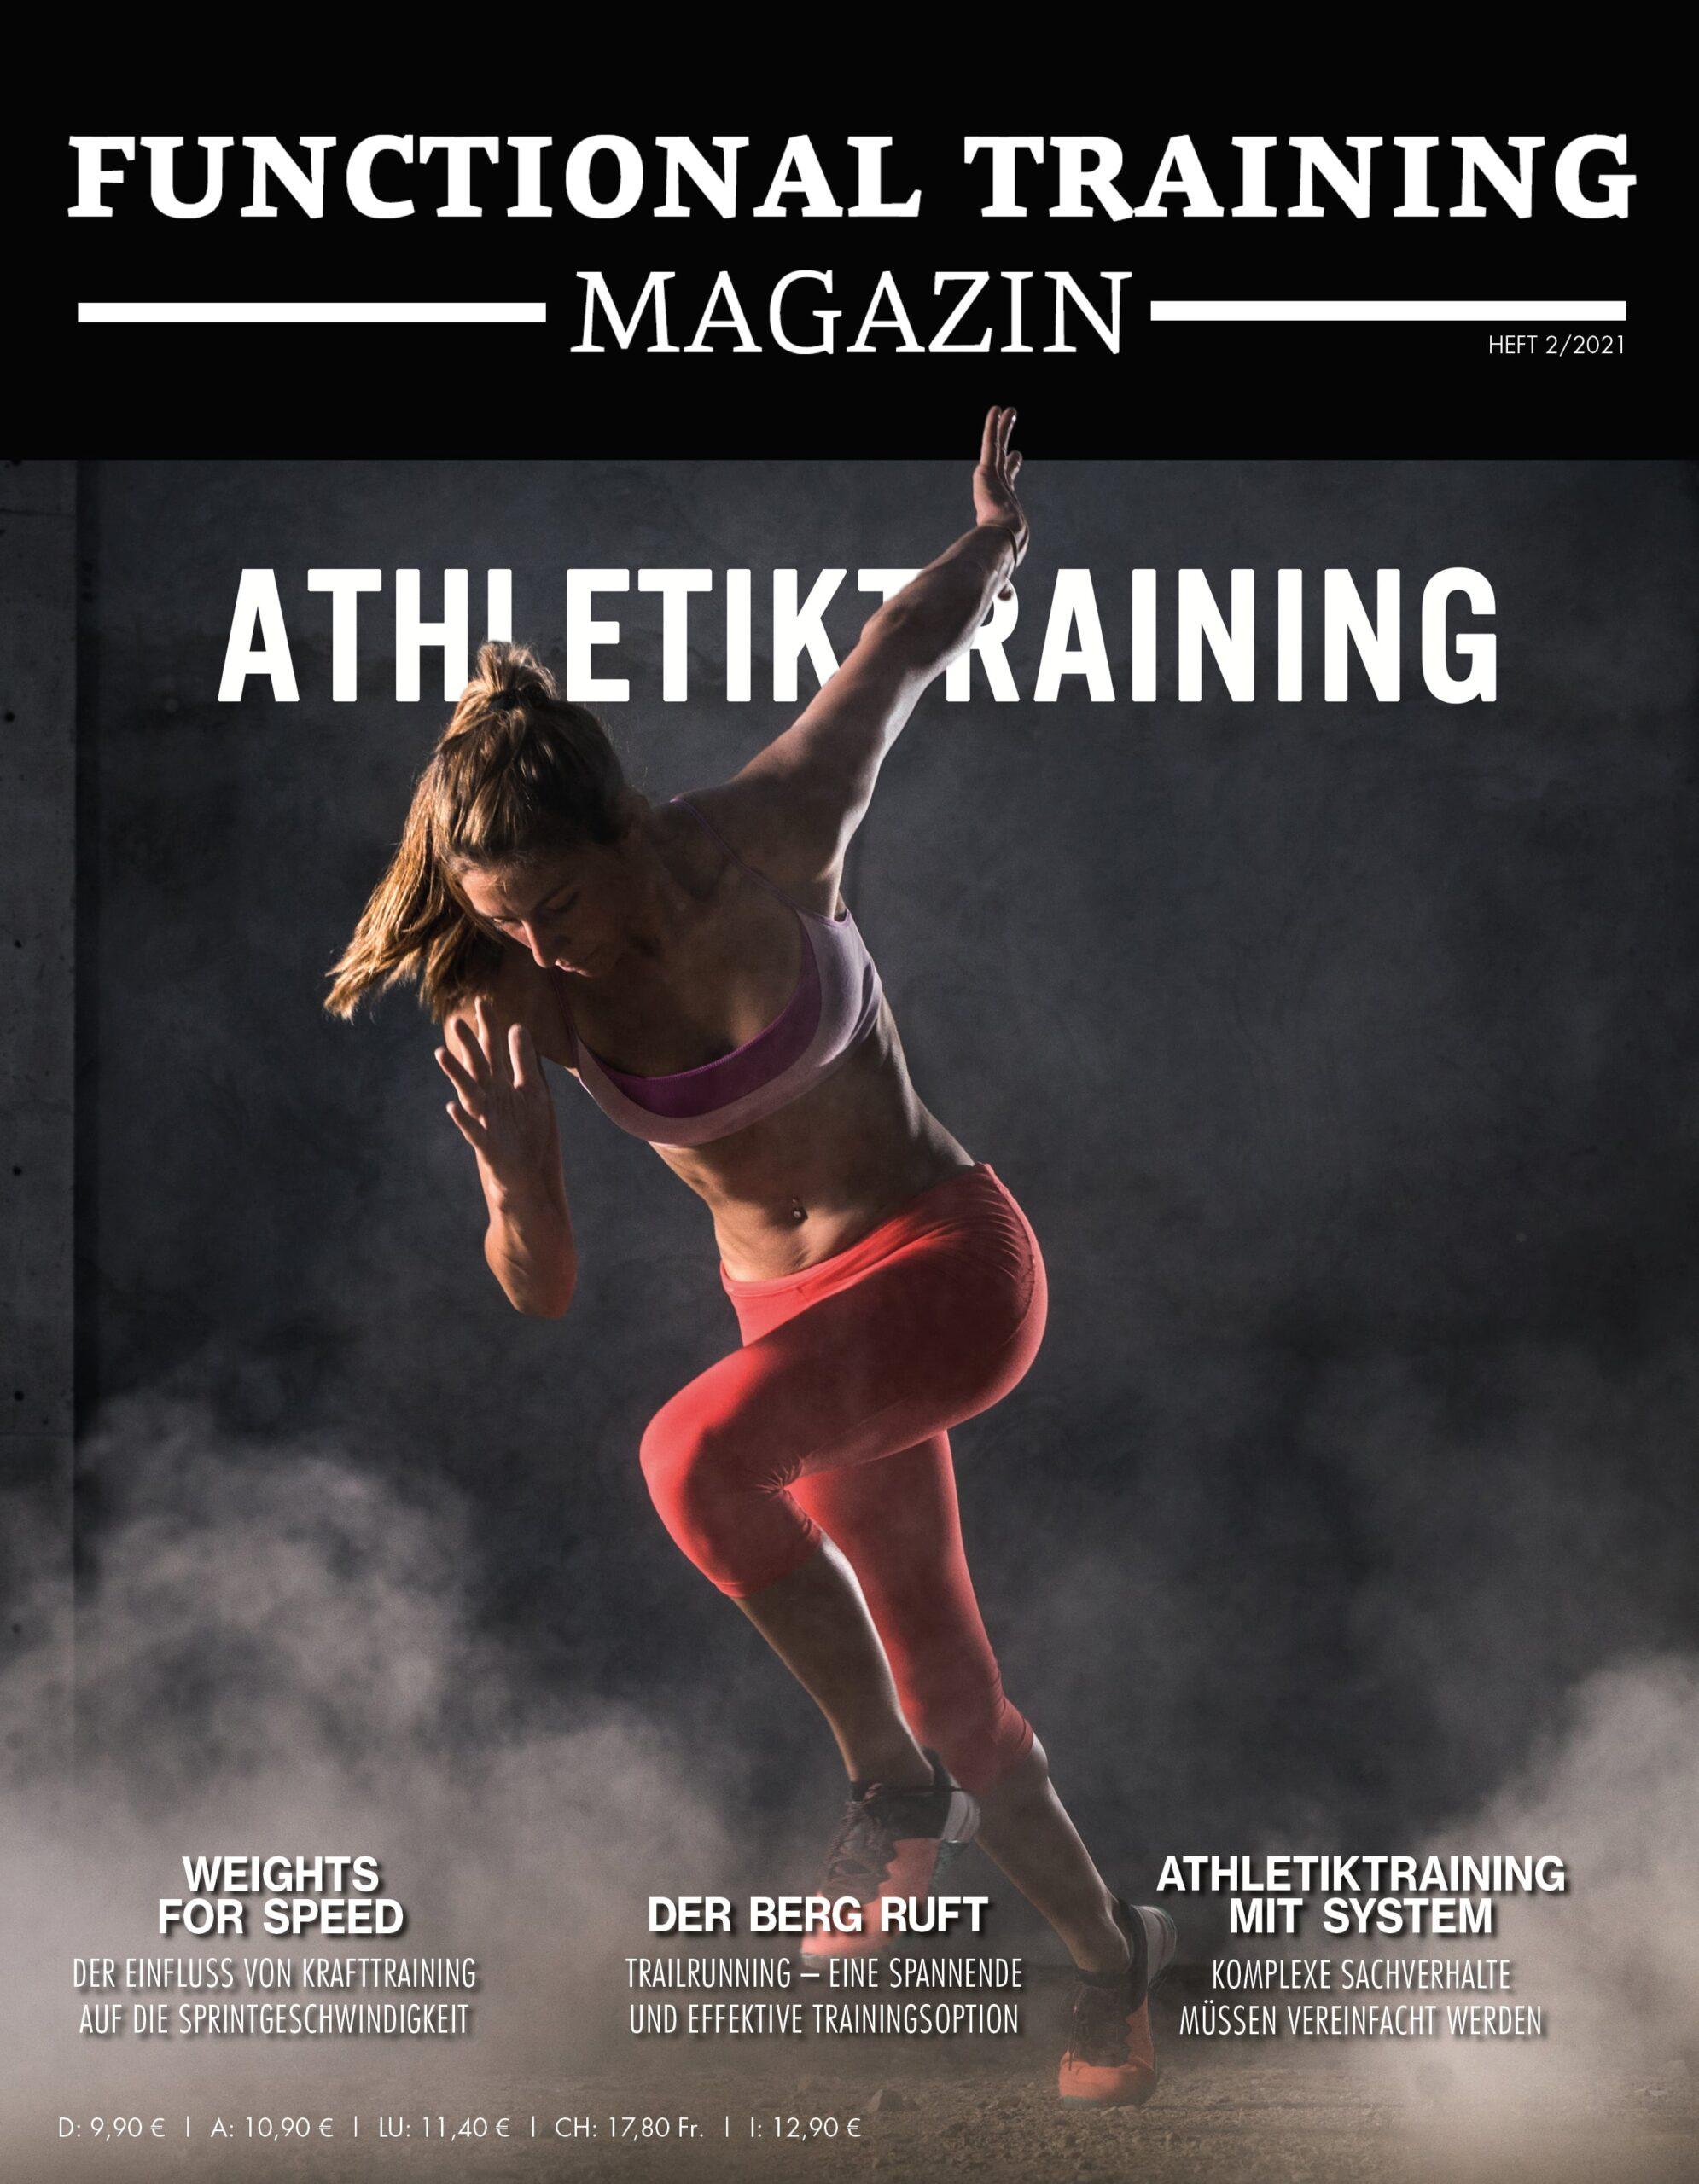 functional-training-magazin-cover-athletiktraining-2-2021-klein